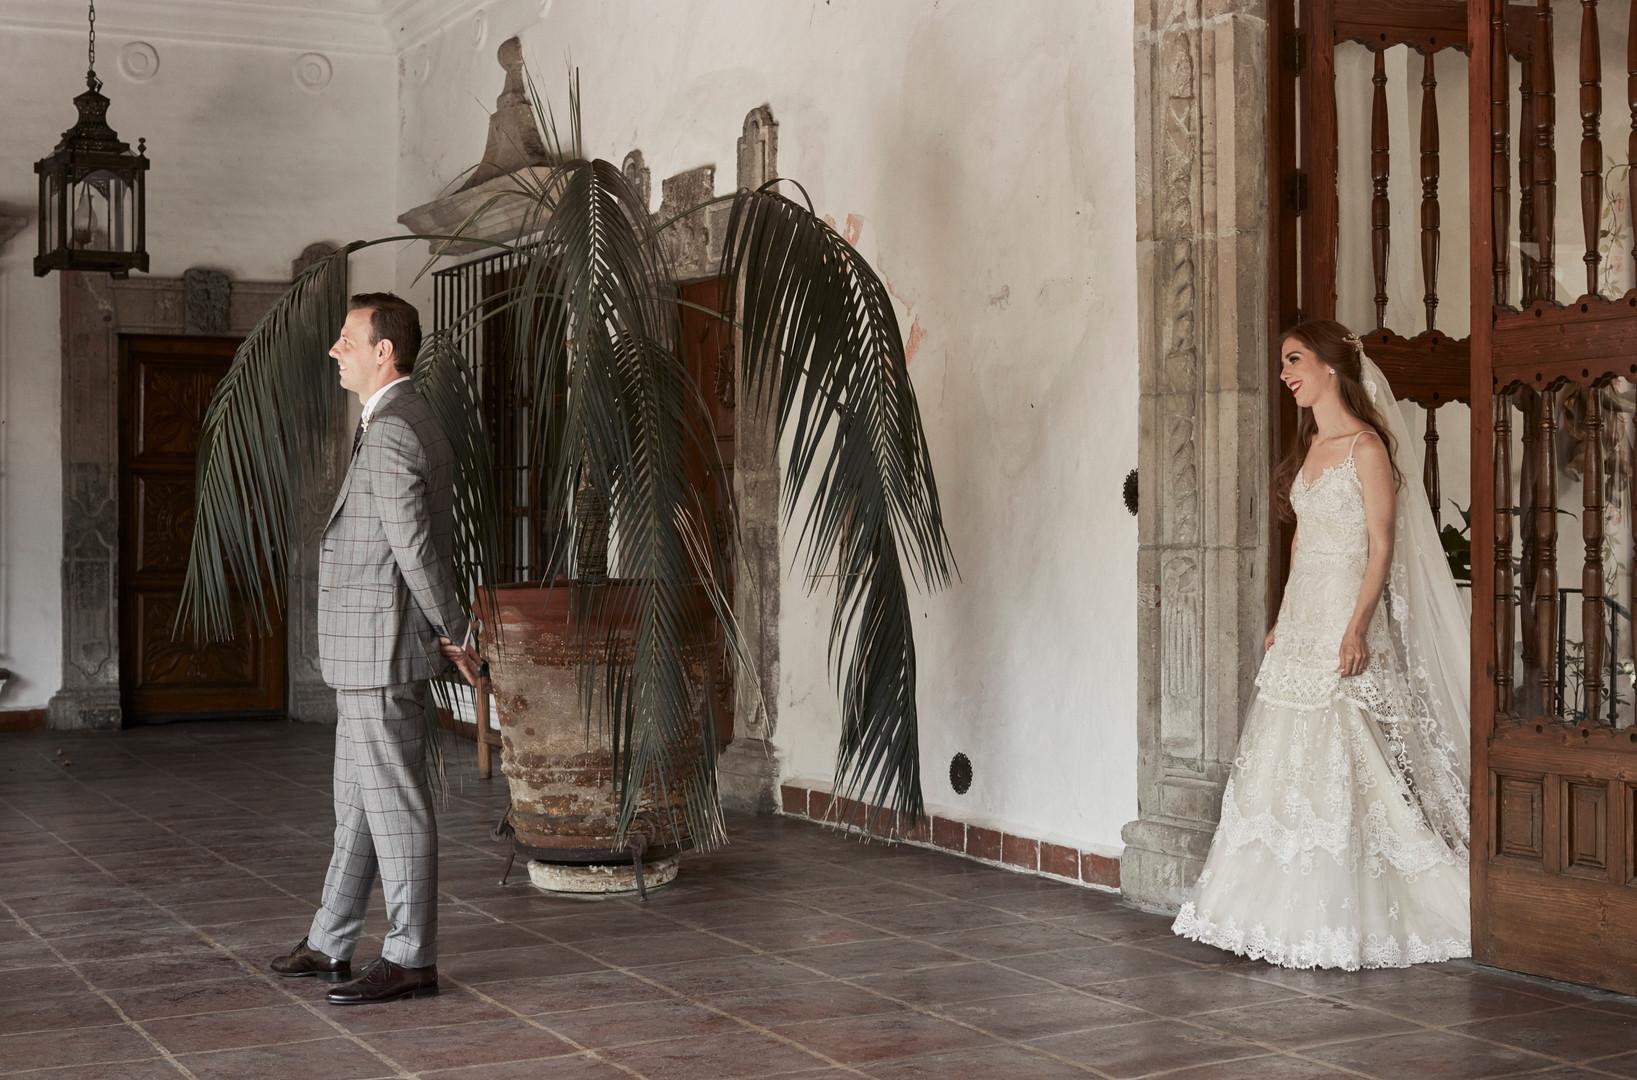 WEDDING_SOFIA_RICARDO_FEB_09_2019__DM431